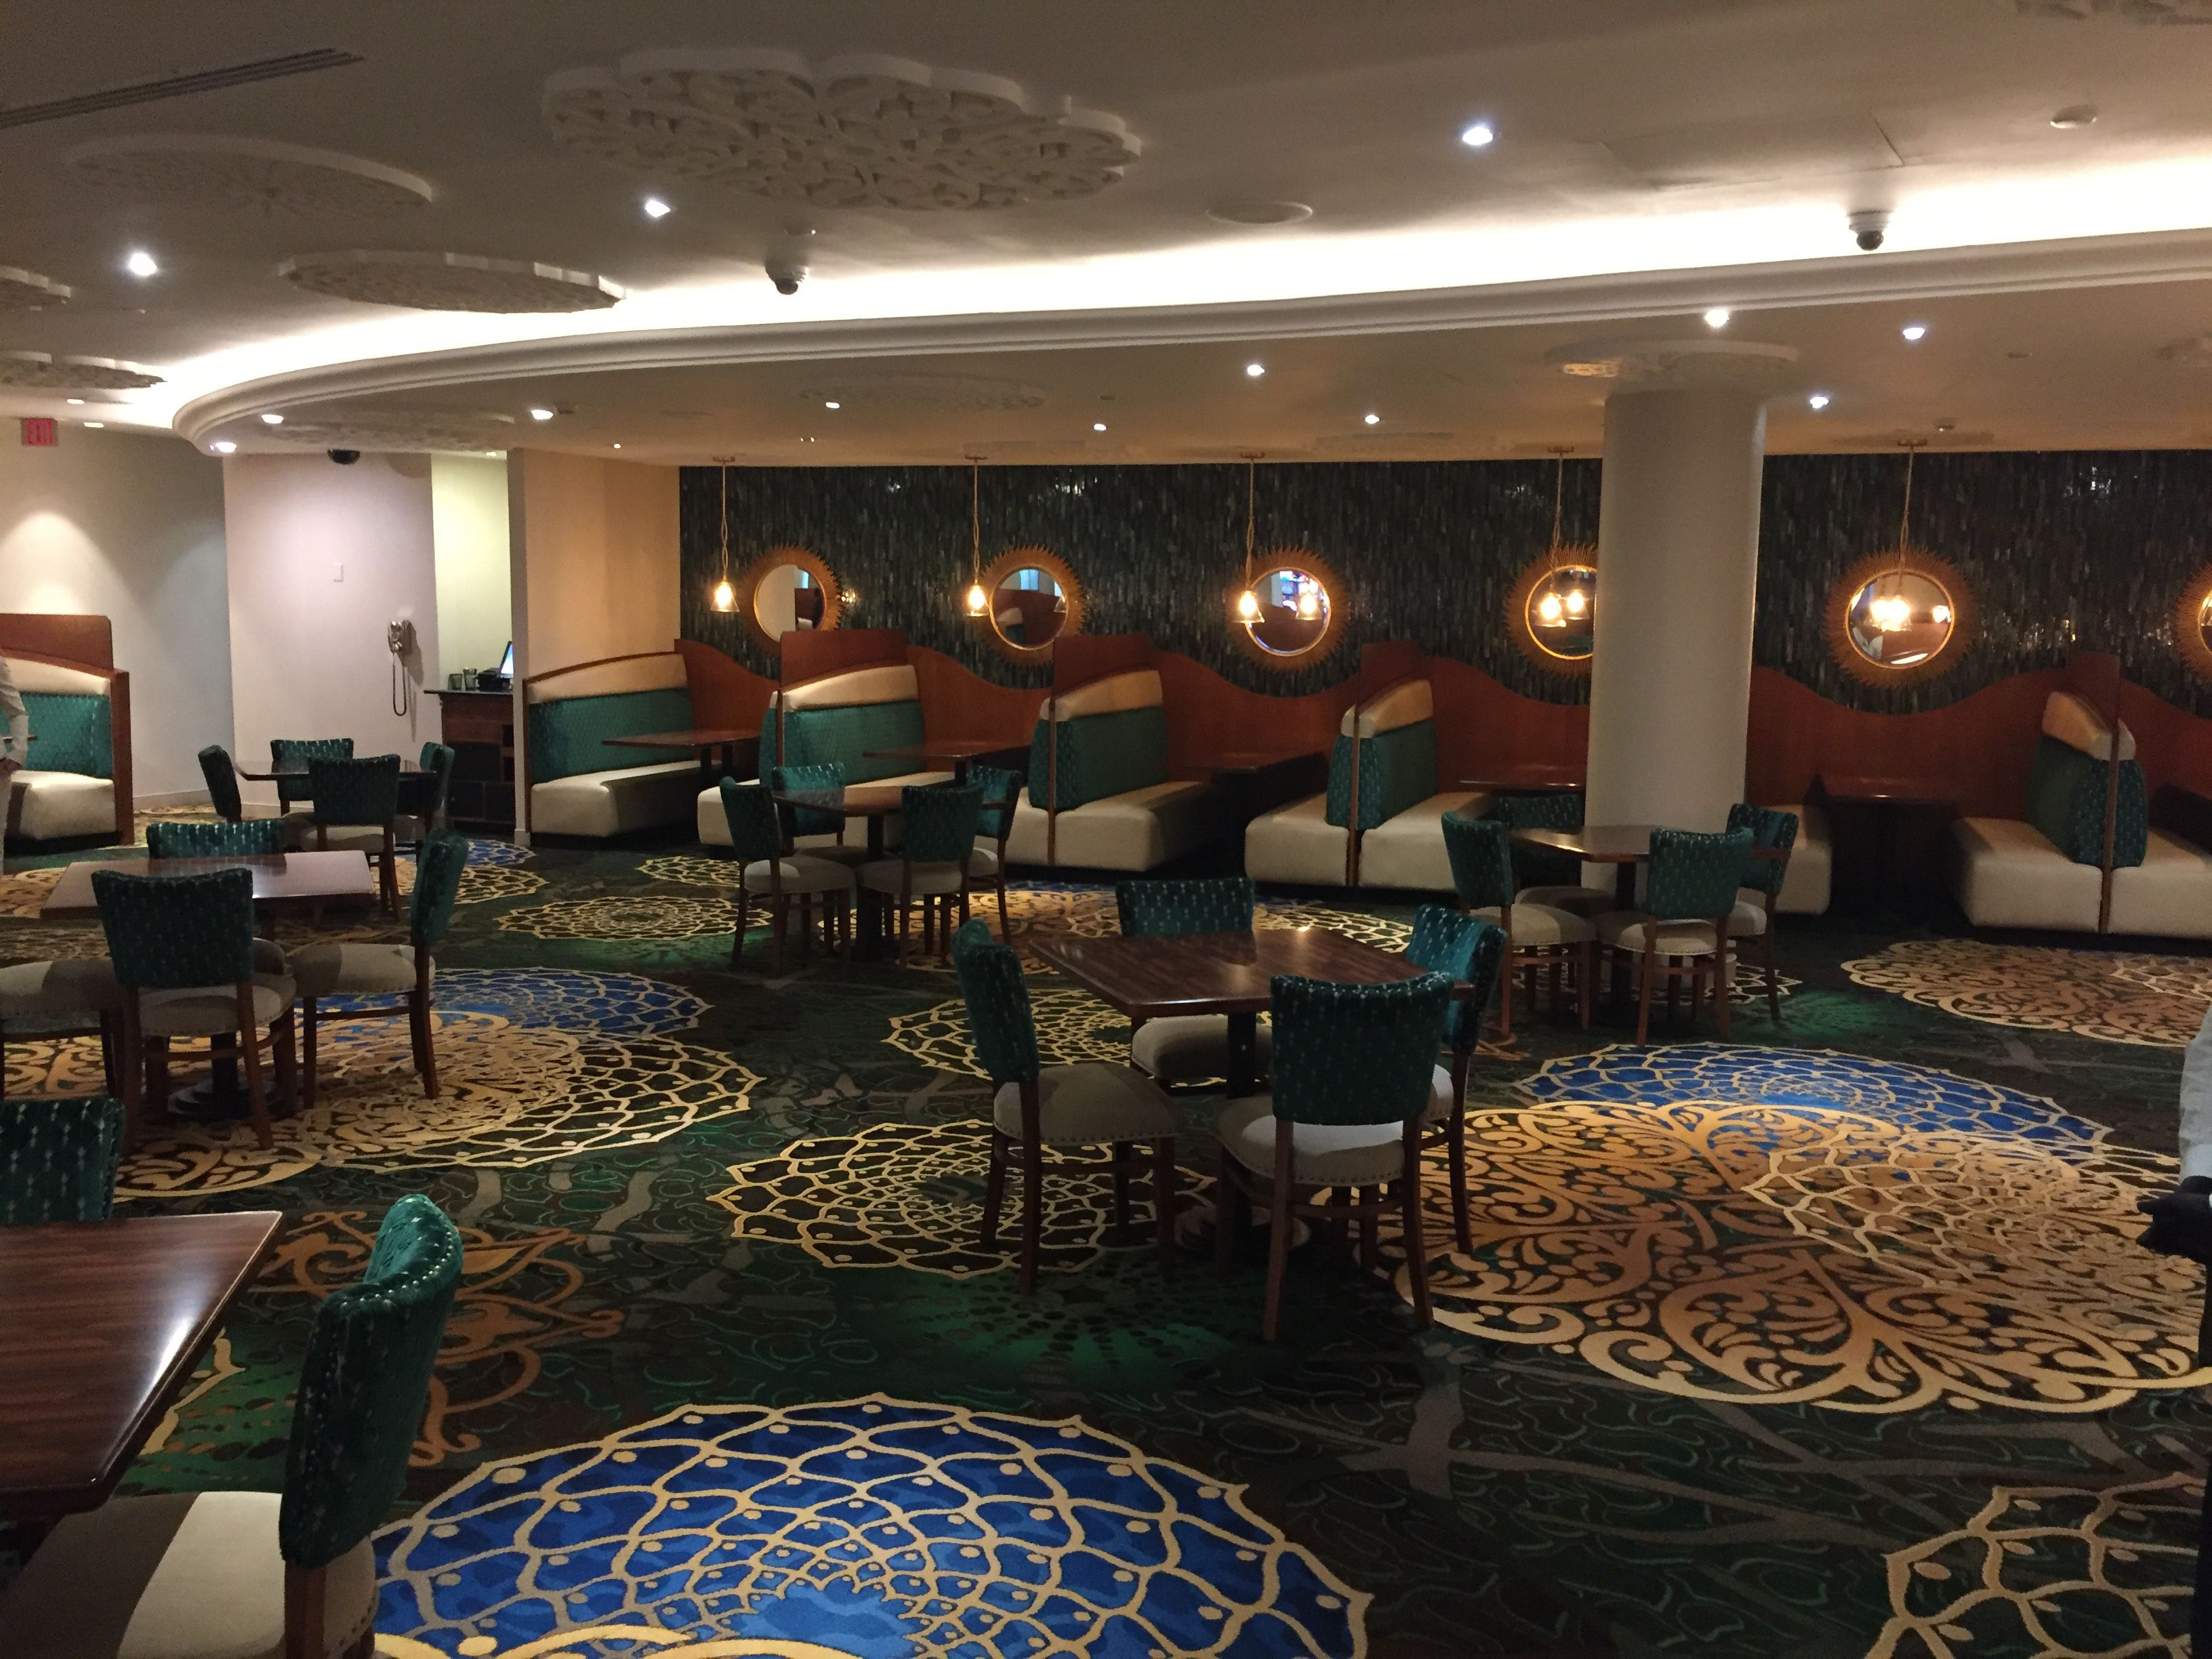 Ready To Play:' Turning Stone, Other Oneida Nation Casinos With Regard To Turning Stone Bingo Hall Calendar